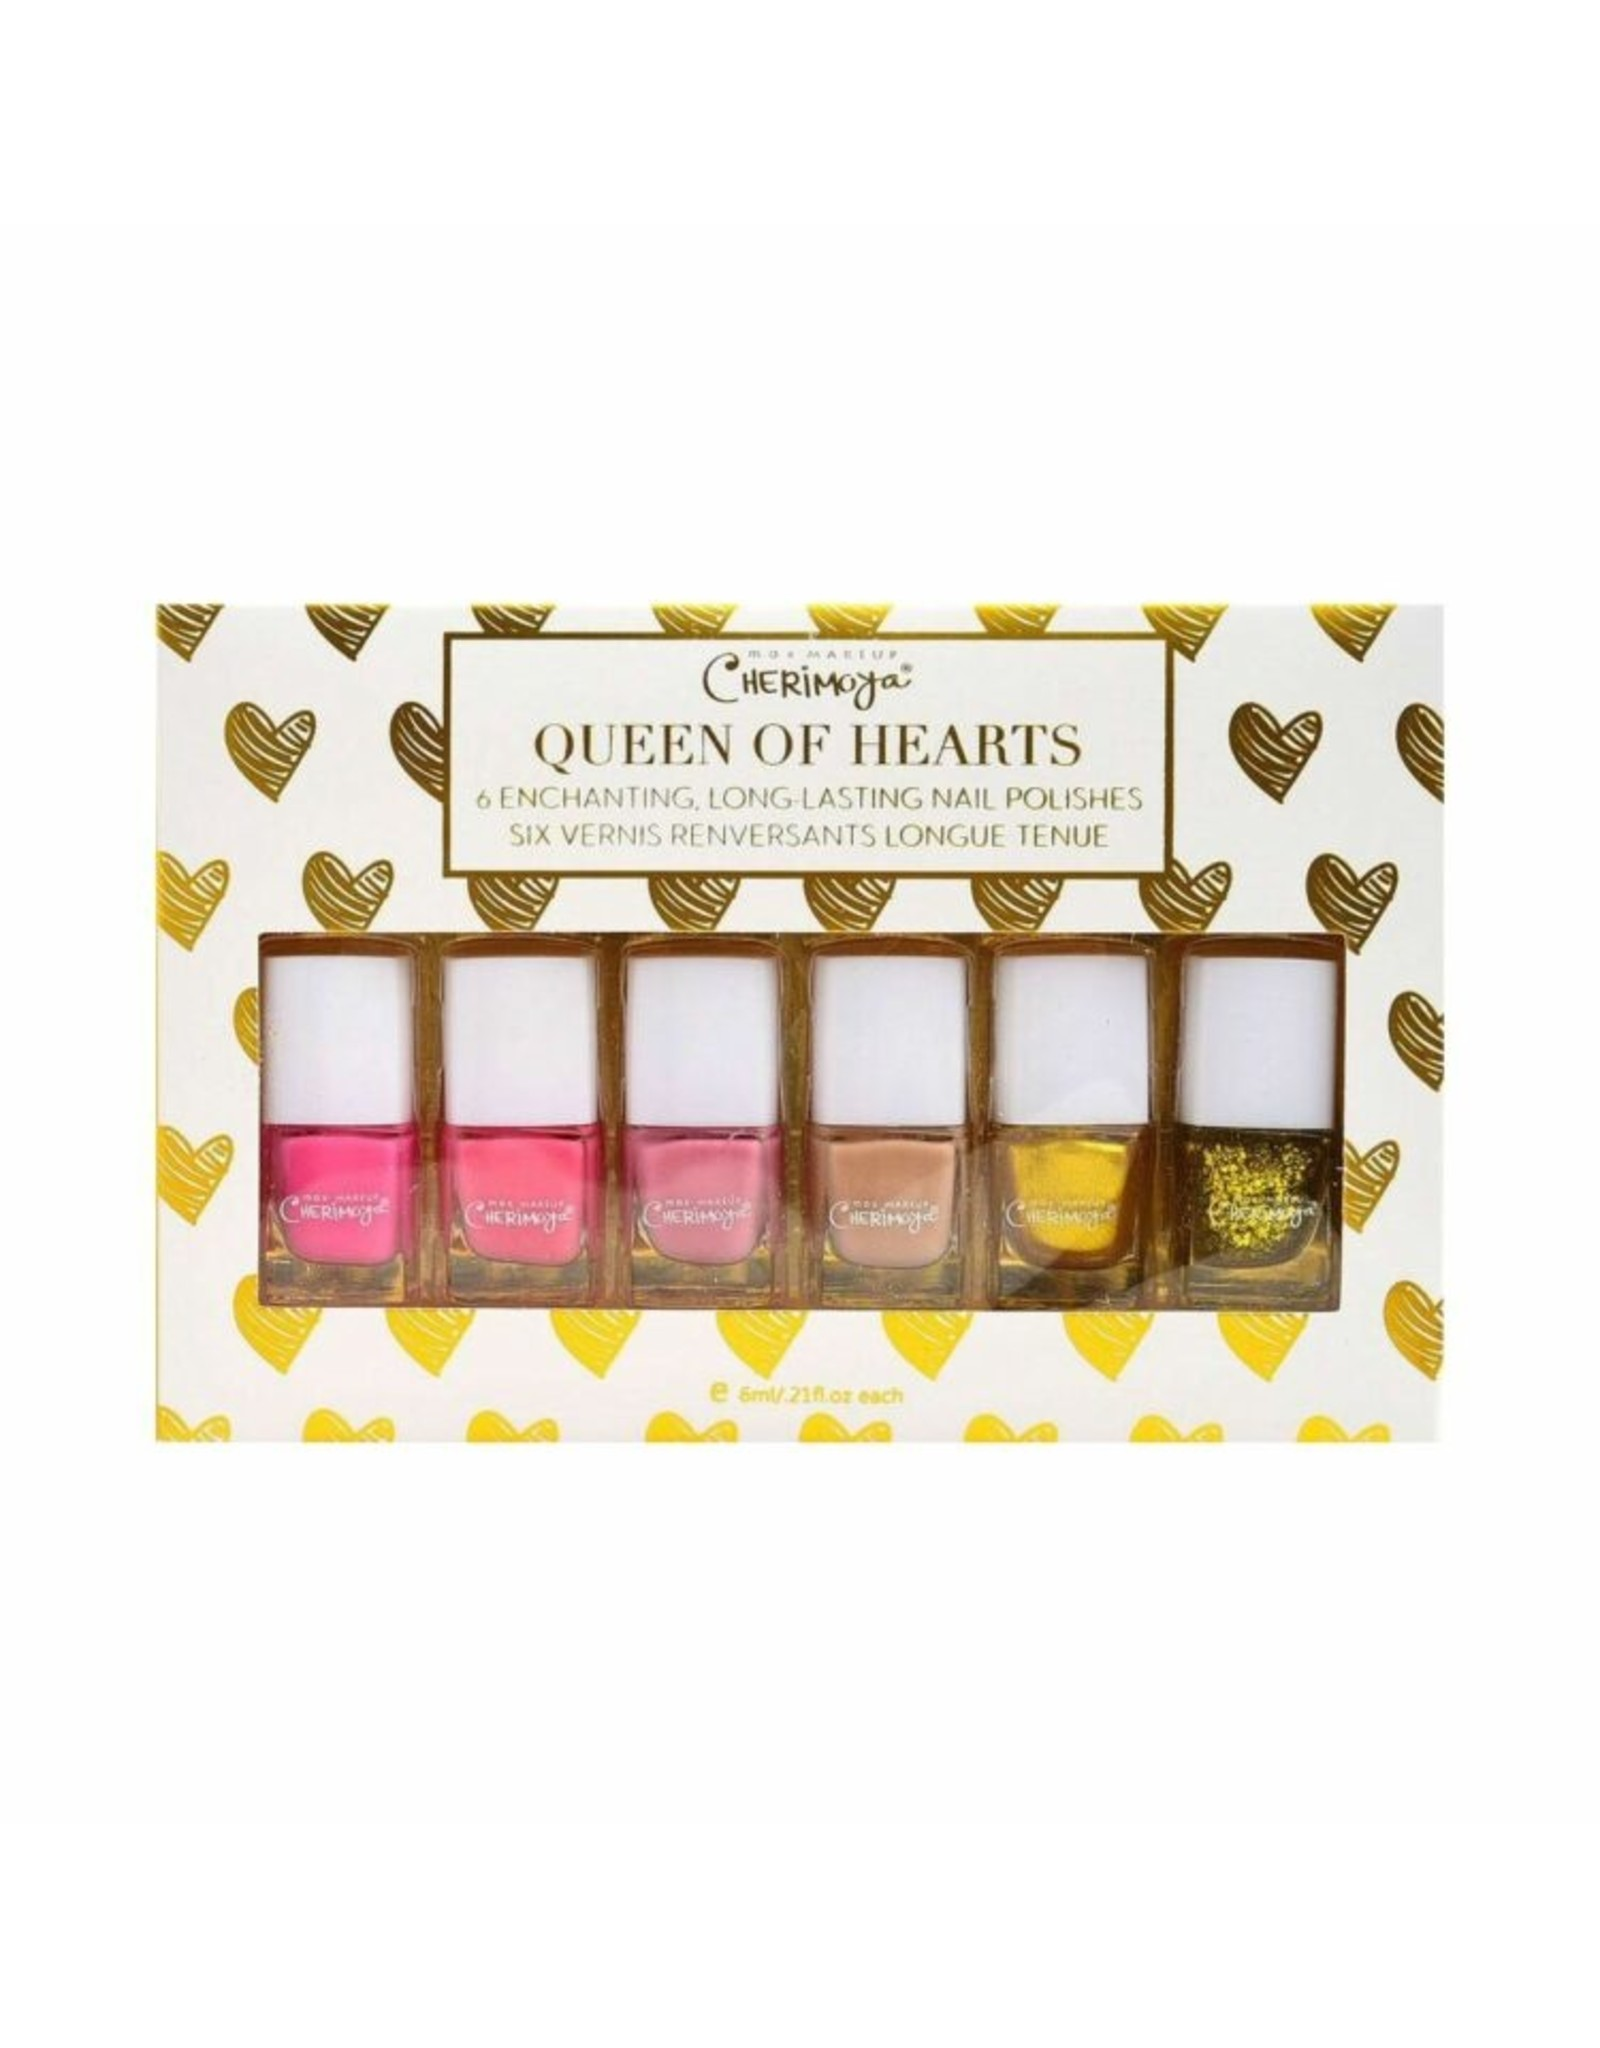 Queen of Hearts 6 PCS Nail Polish Set